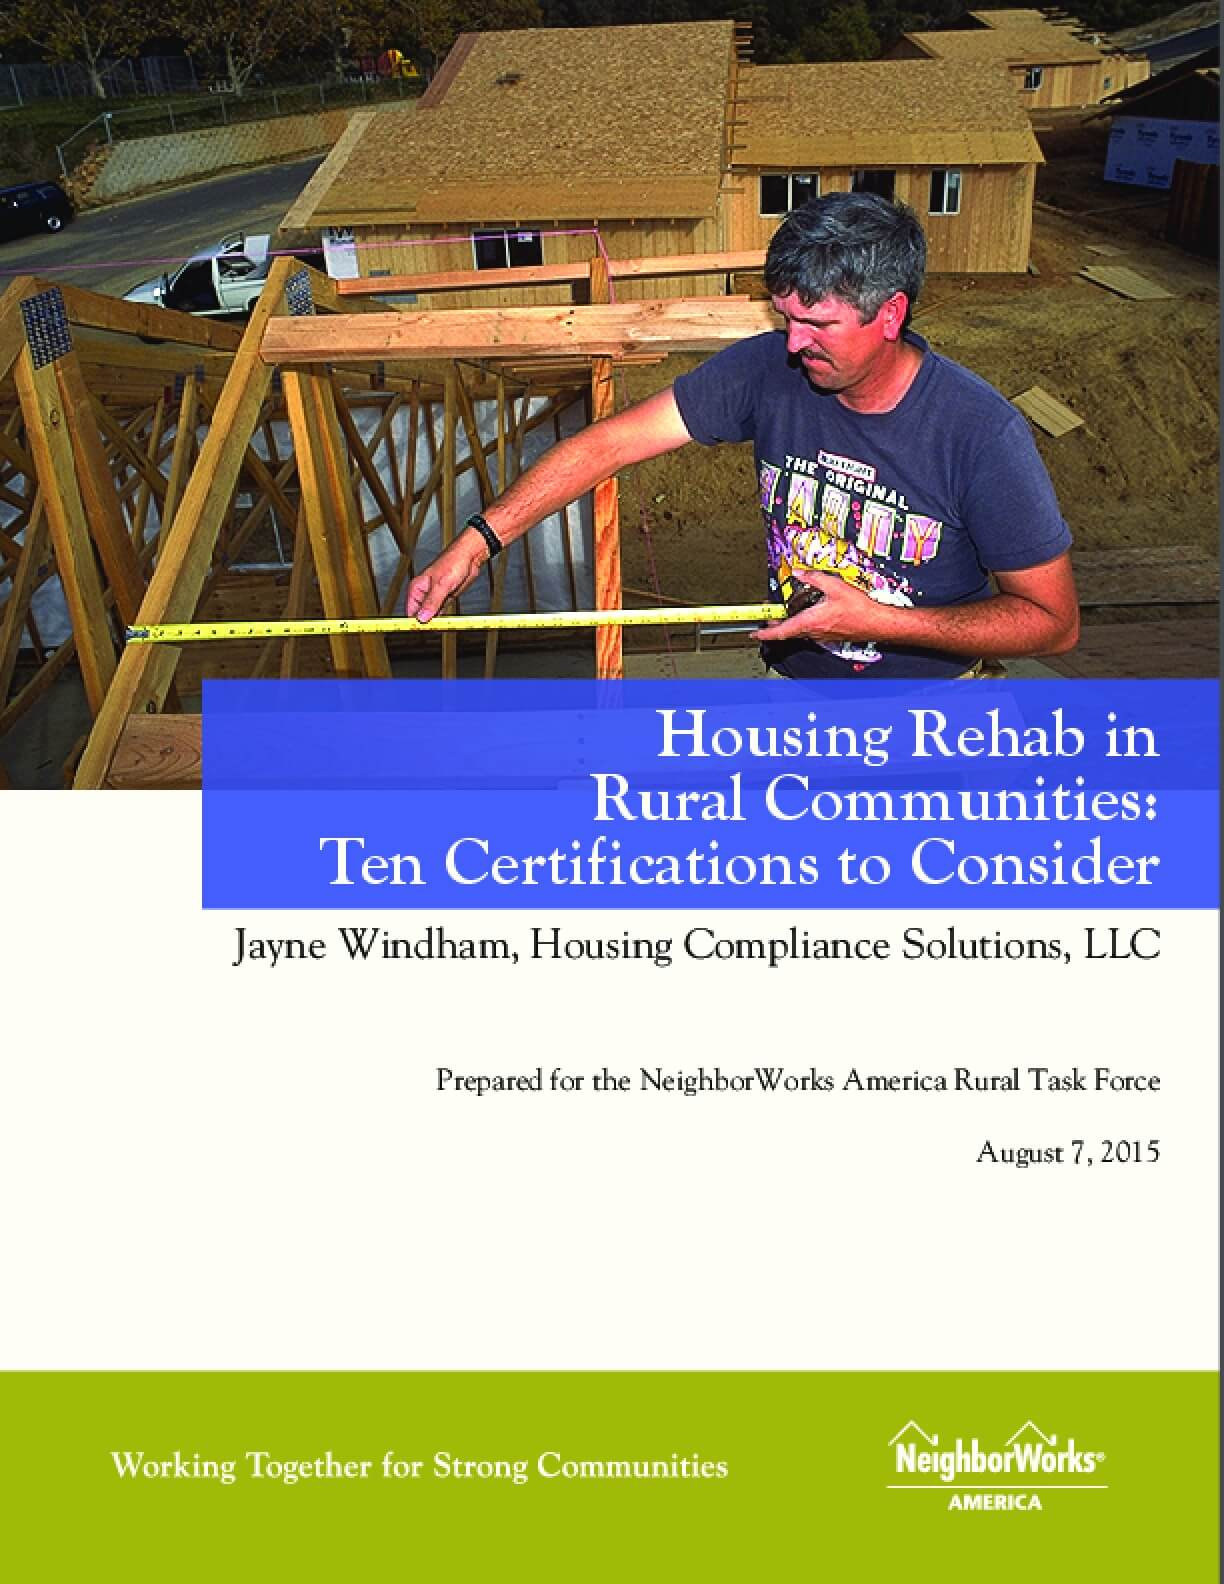 Housing Rehab in Rural Communities: Ten Certifications to Consider